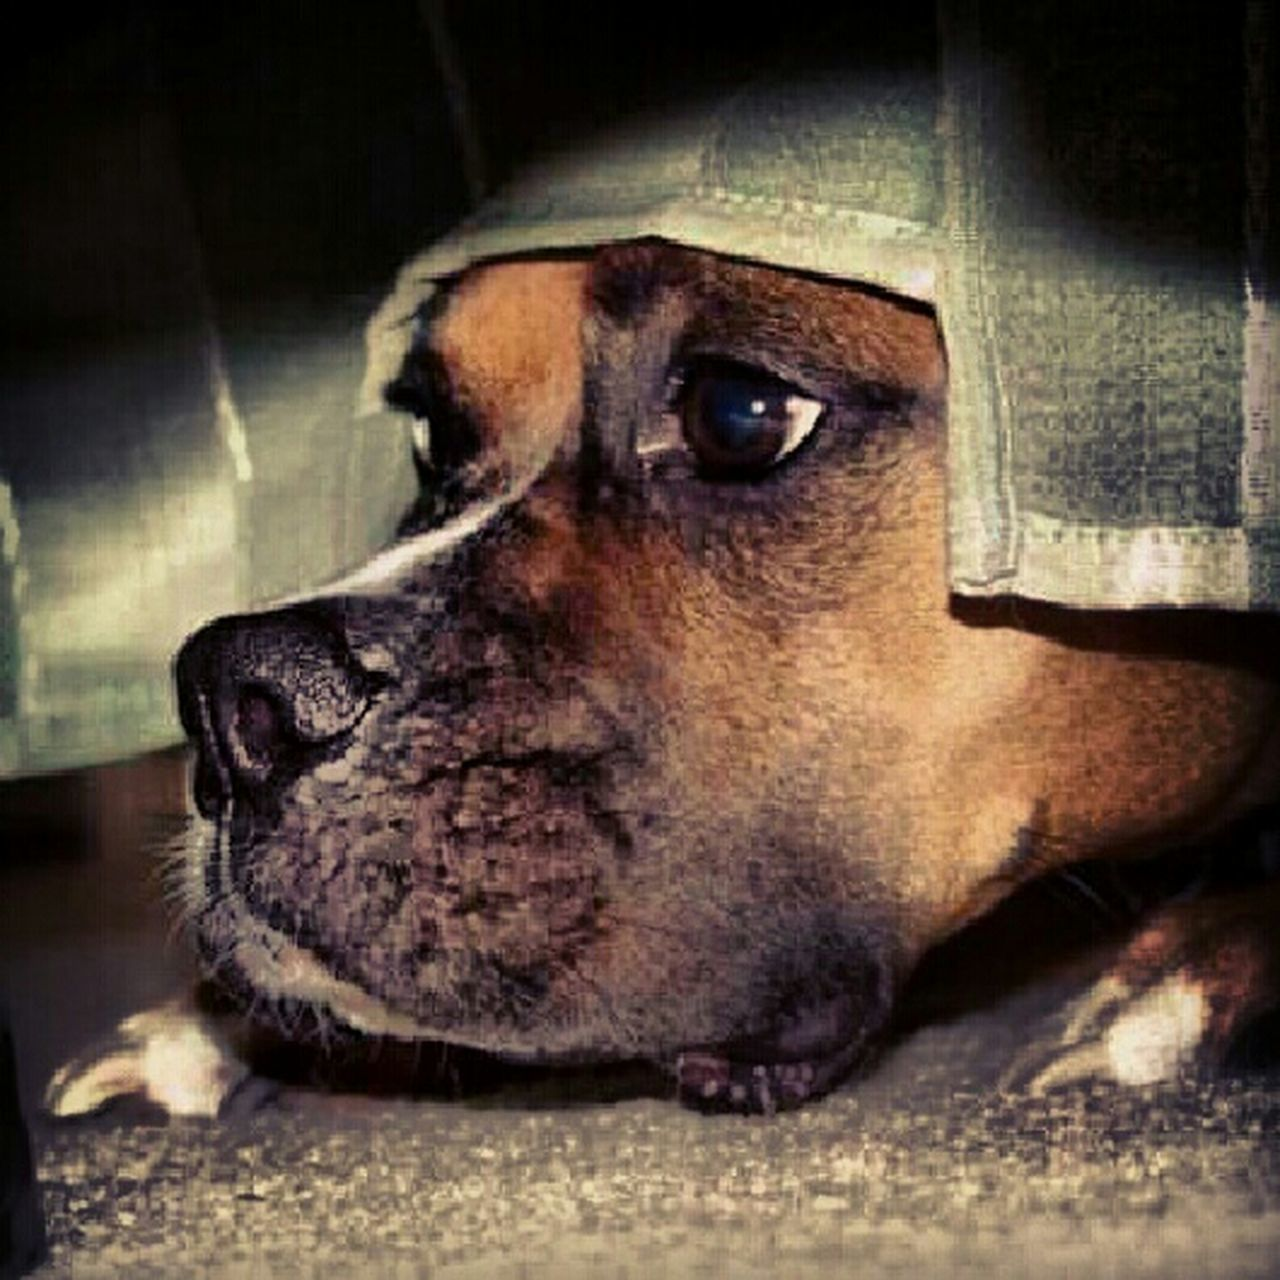 dog, pets, one animal, domestic animals, close-up, animal themes, animal head, no people, indoors, portrait, mammal, day